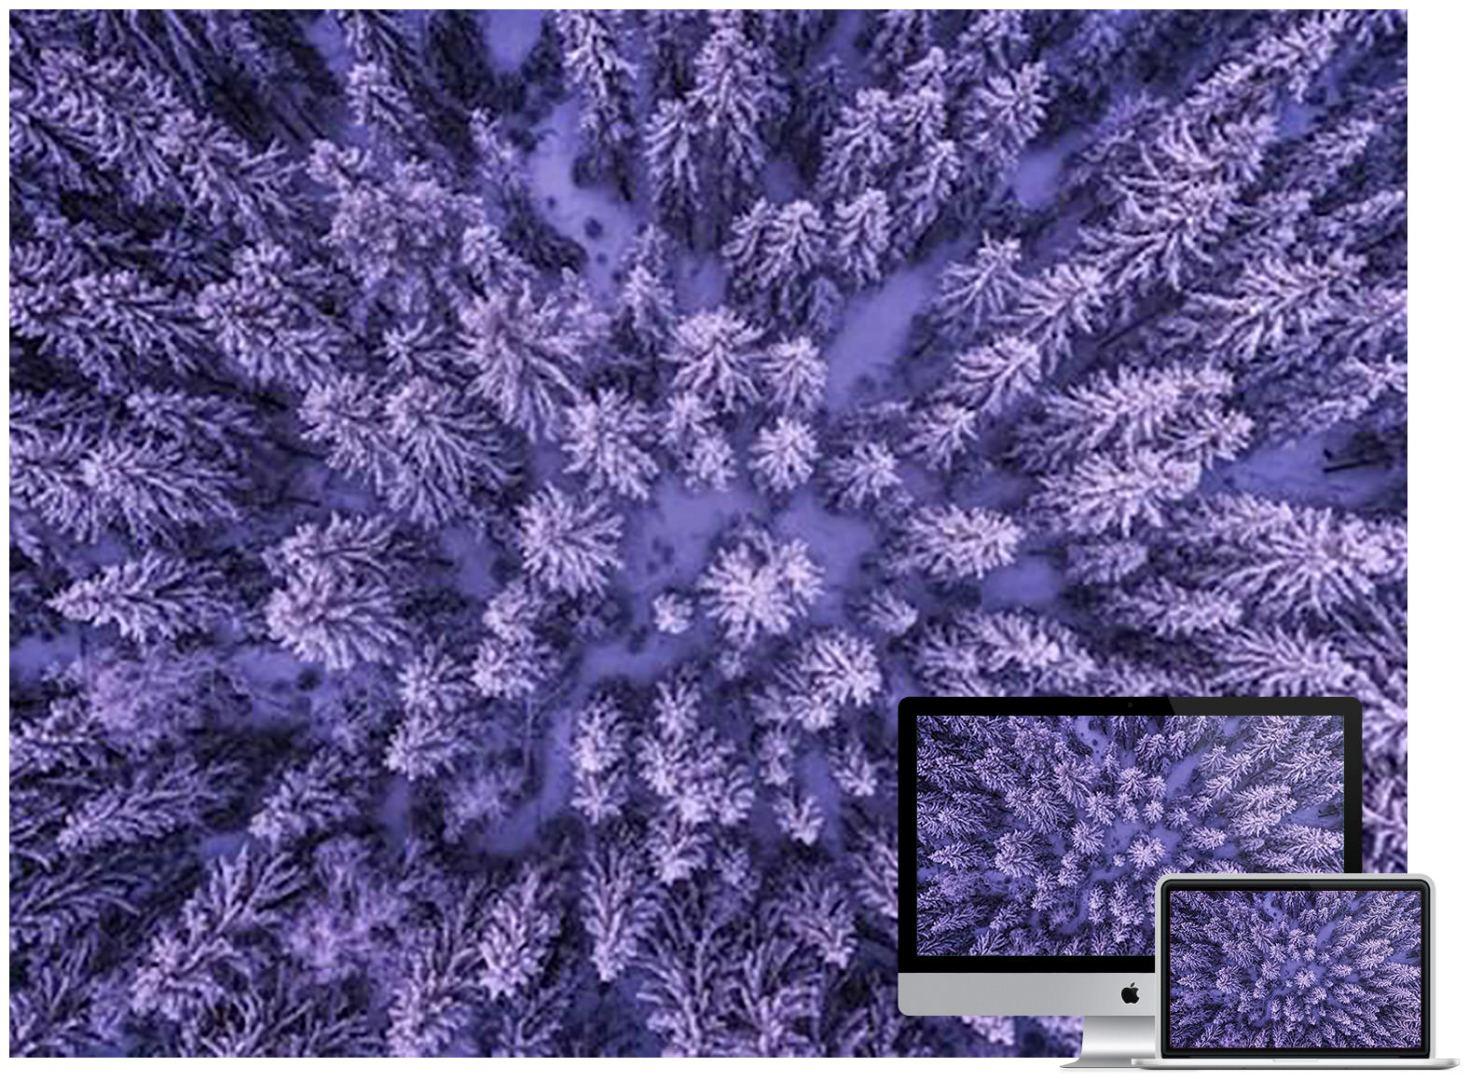 snowy-forest-t2-wallpaper